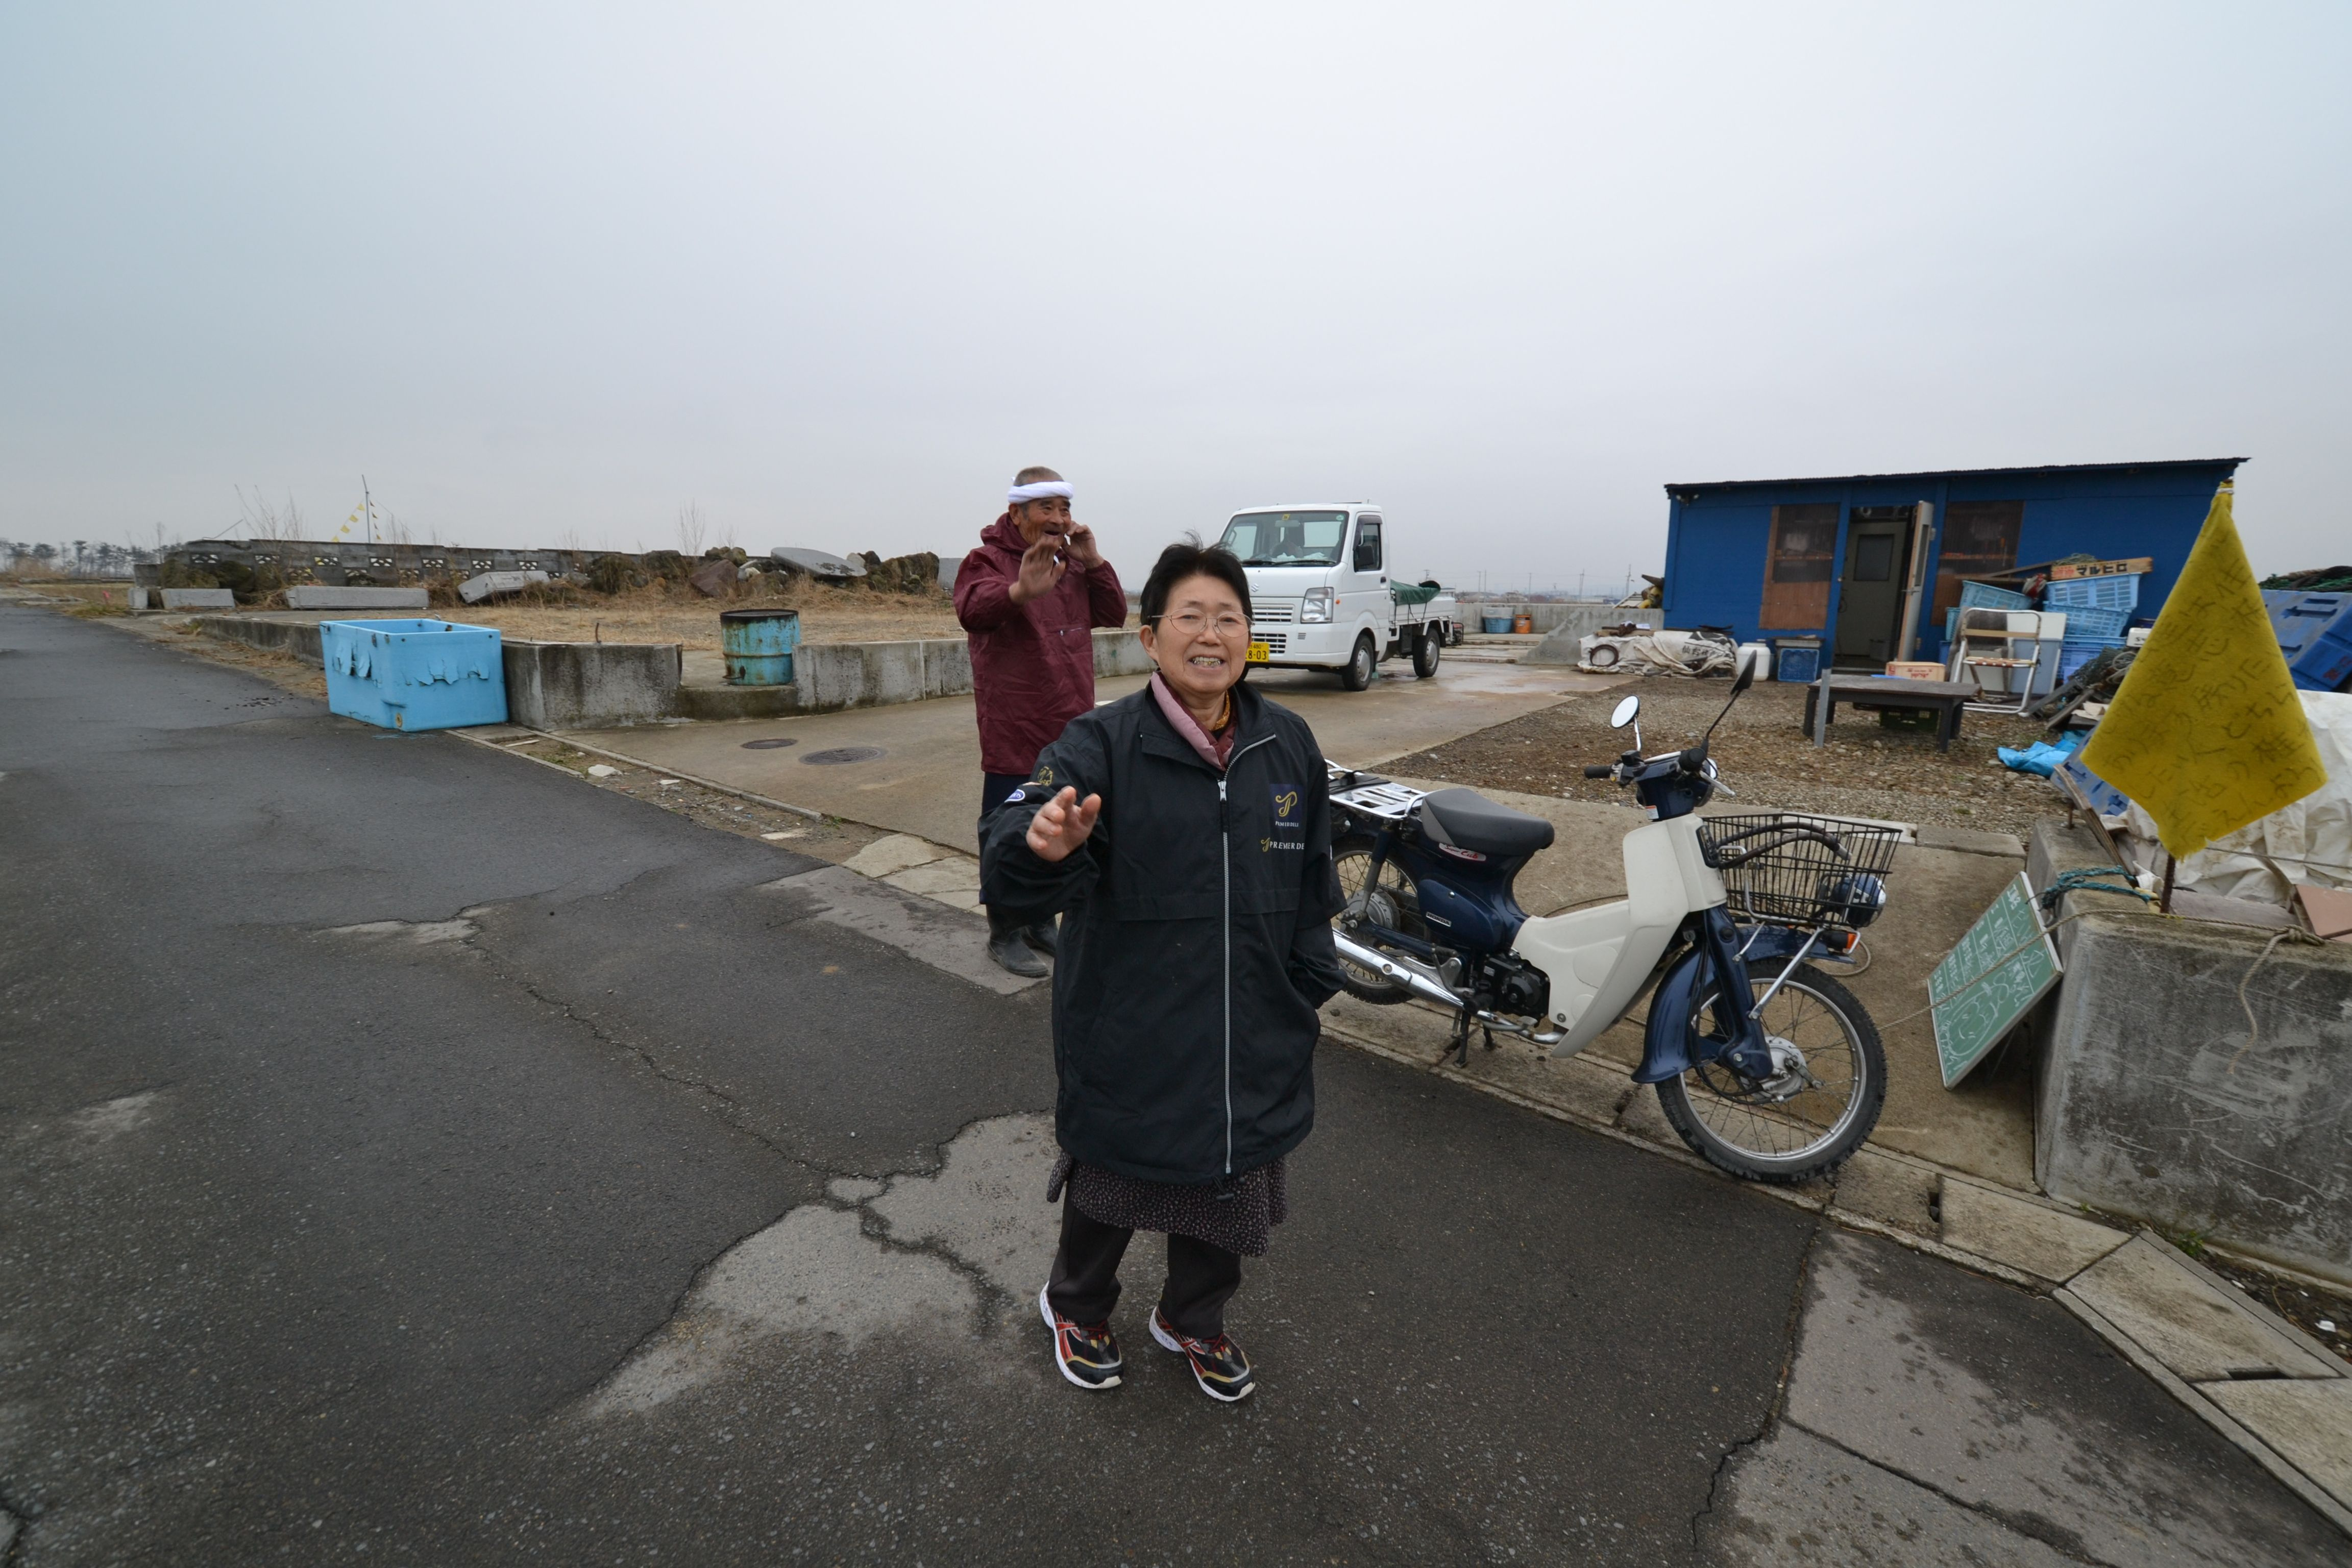 arahama sato fishing family by gareki shack wave good bye.jpg